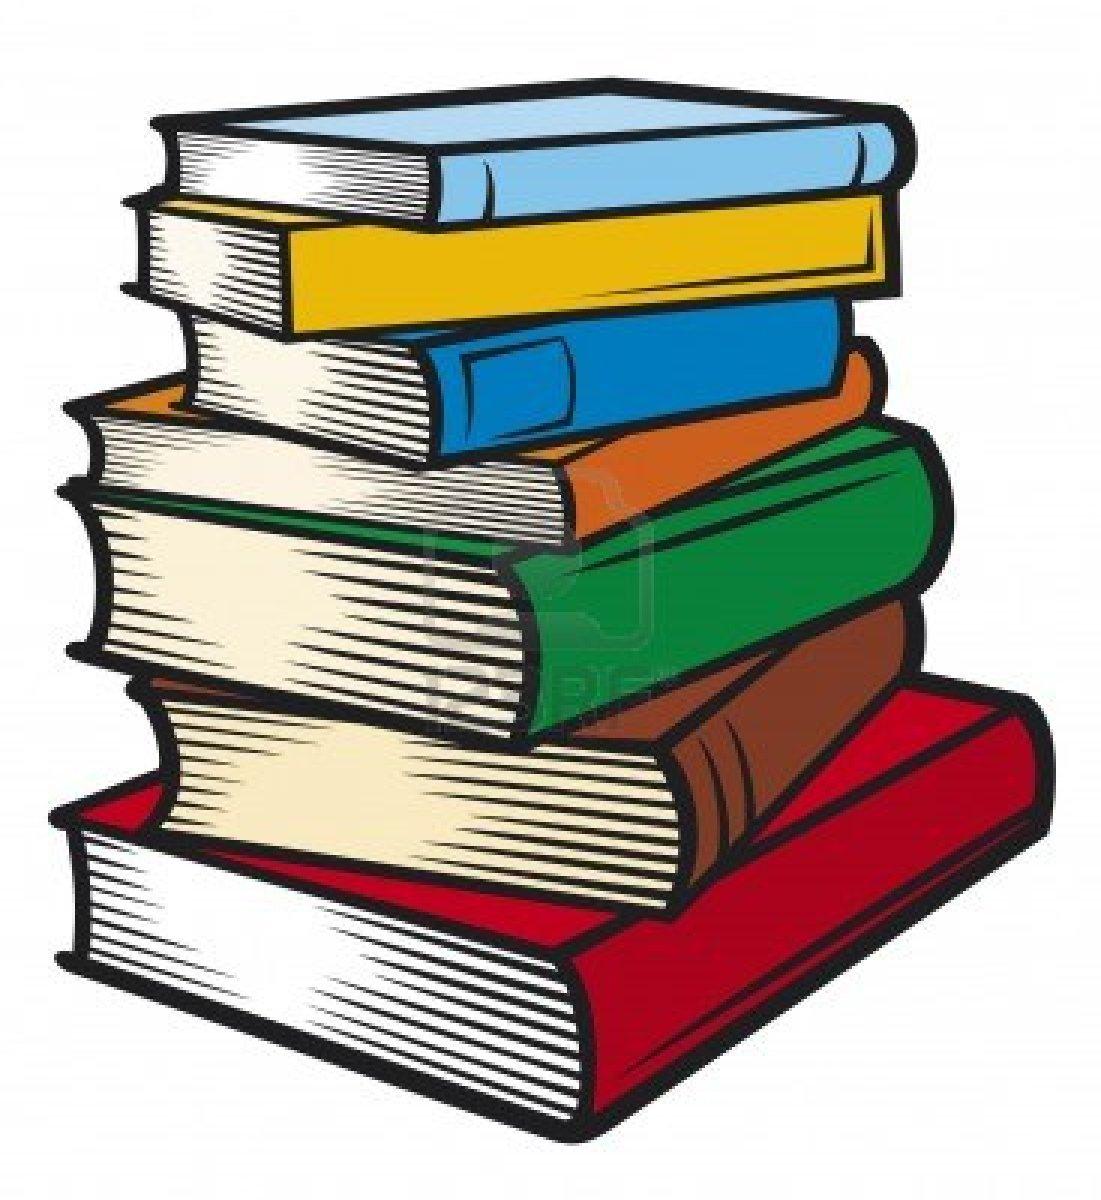 Books Clipart #8204